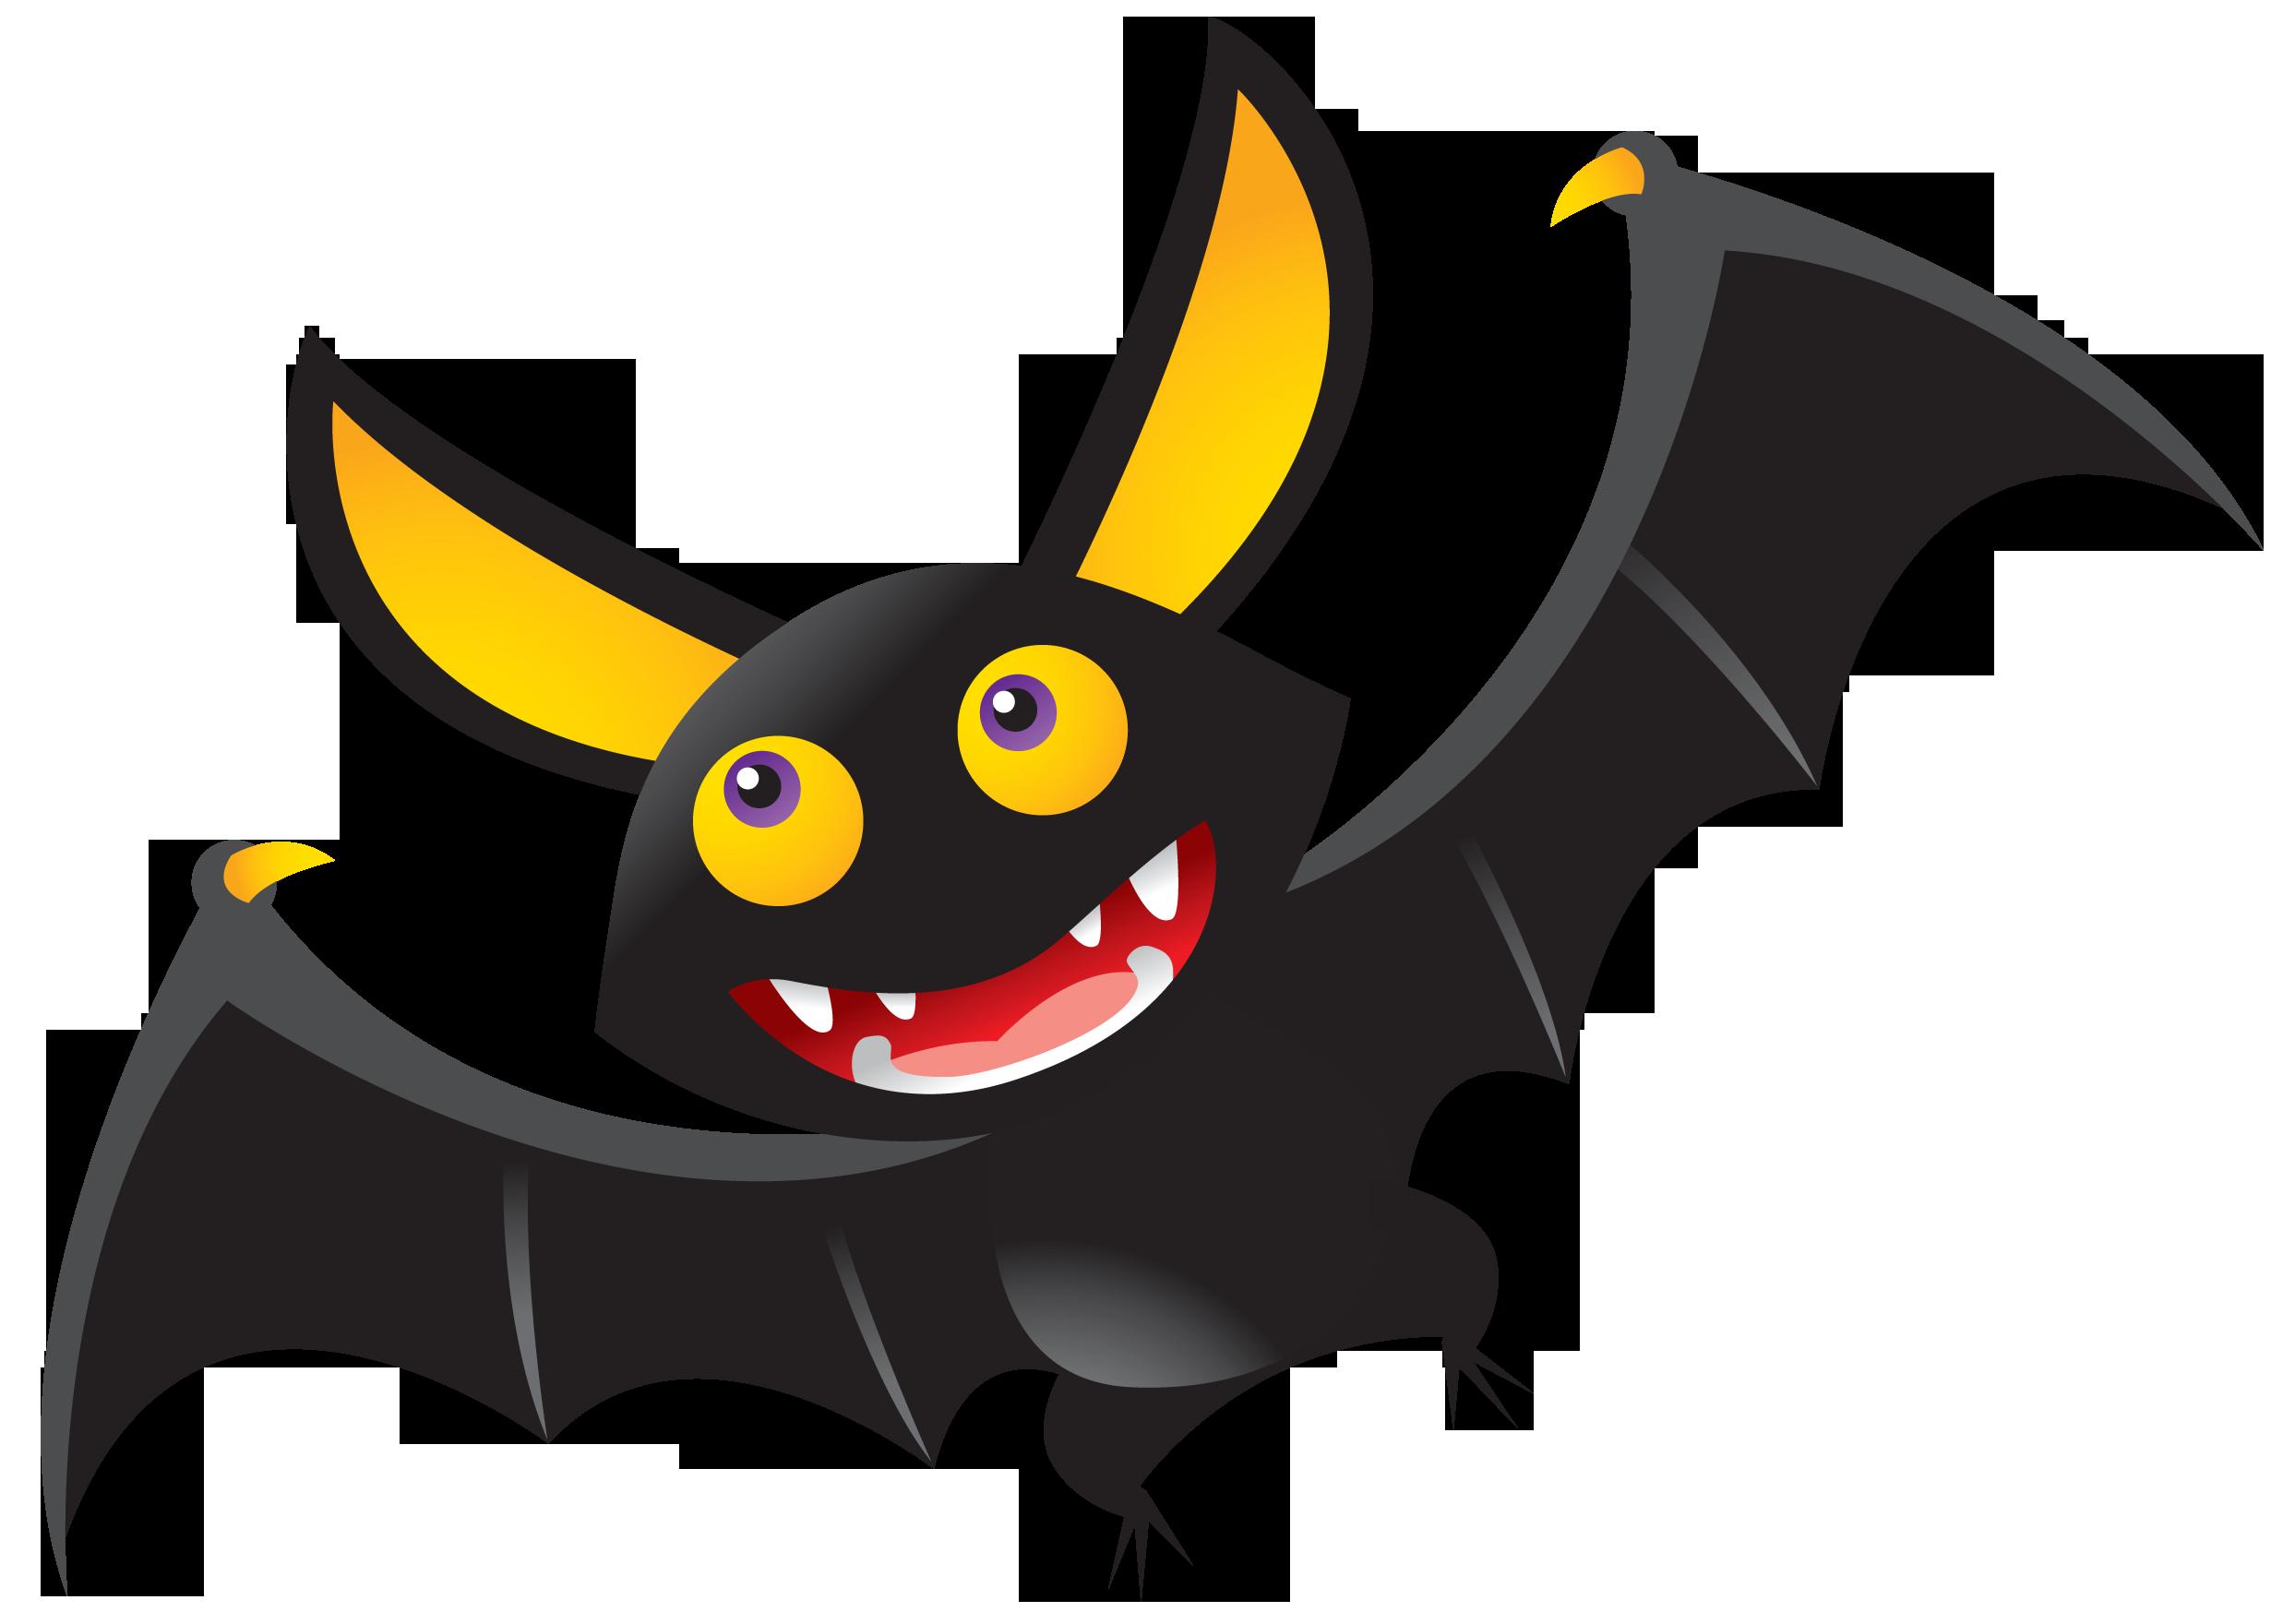 Cute halloween bat clipart png clip royalty free download Cute Halloween Bat Clipart | Clipart Panda - Free Clipart Images clip royalty free download